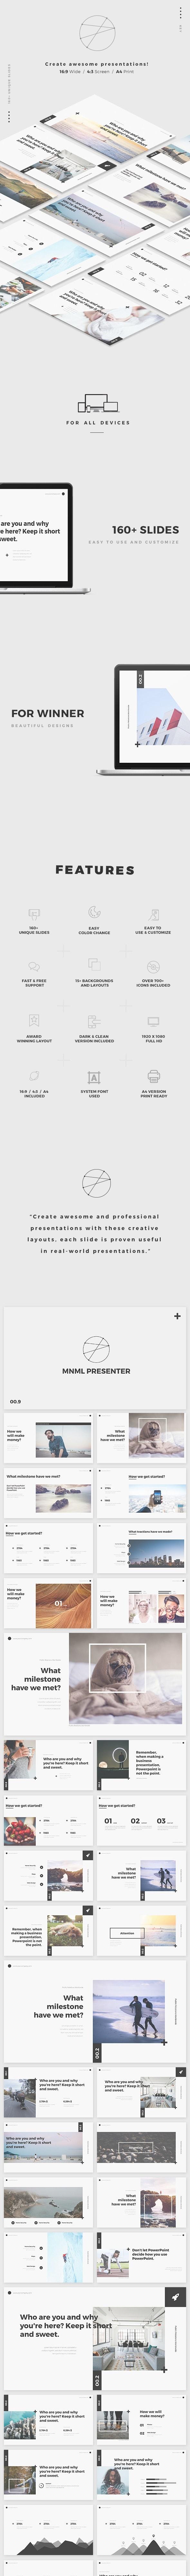 MNML Keynote - Keynote Templates Presentation Templates